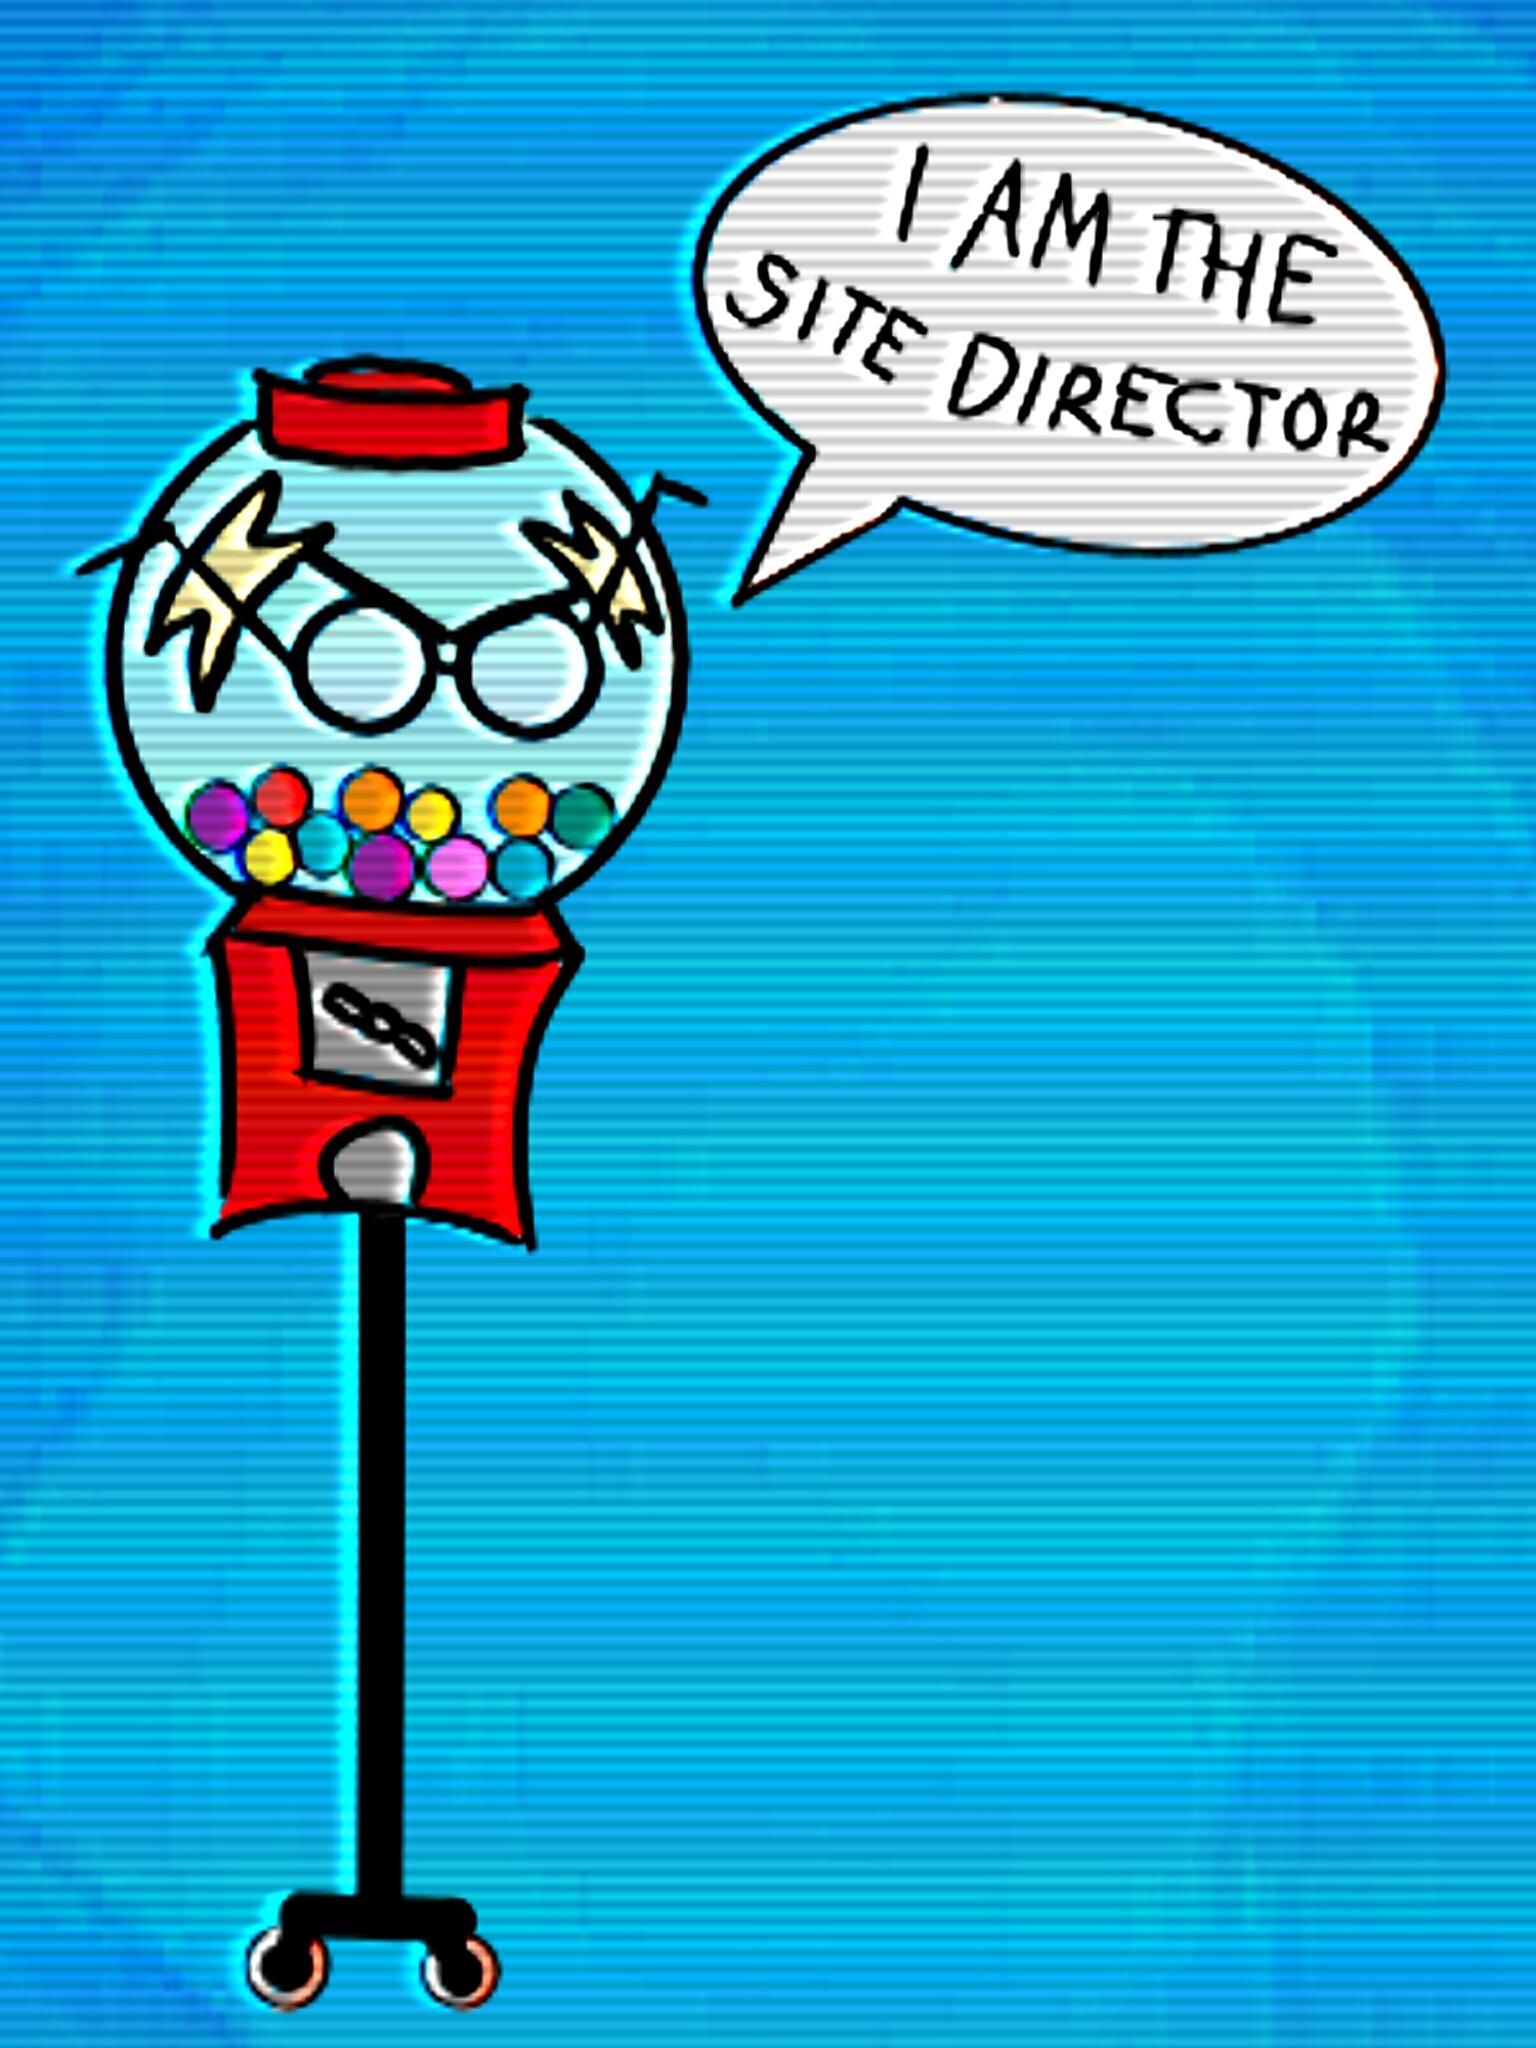 Site%20Director.jpg